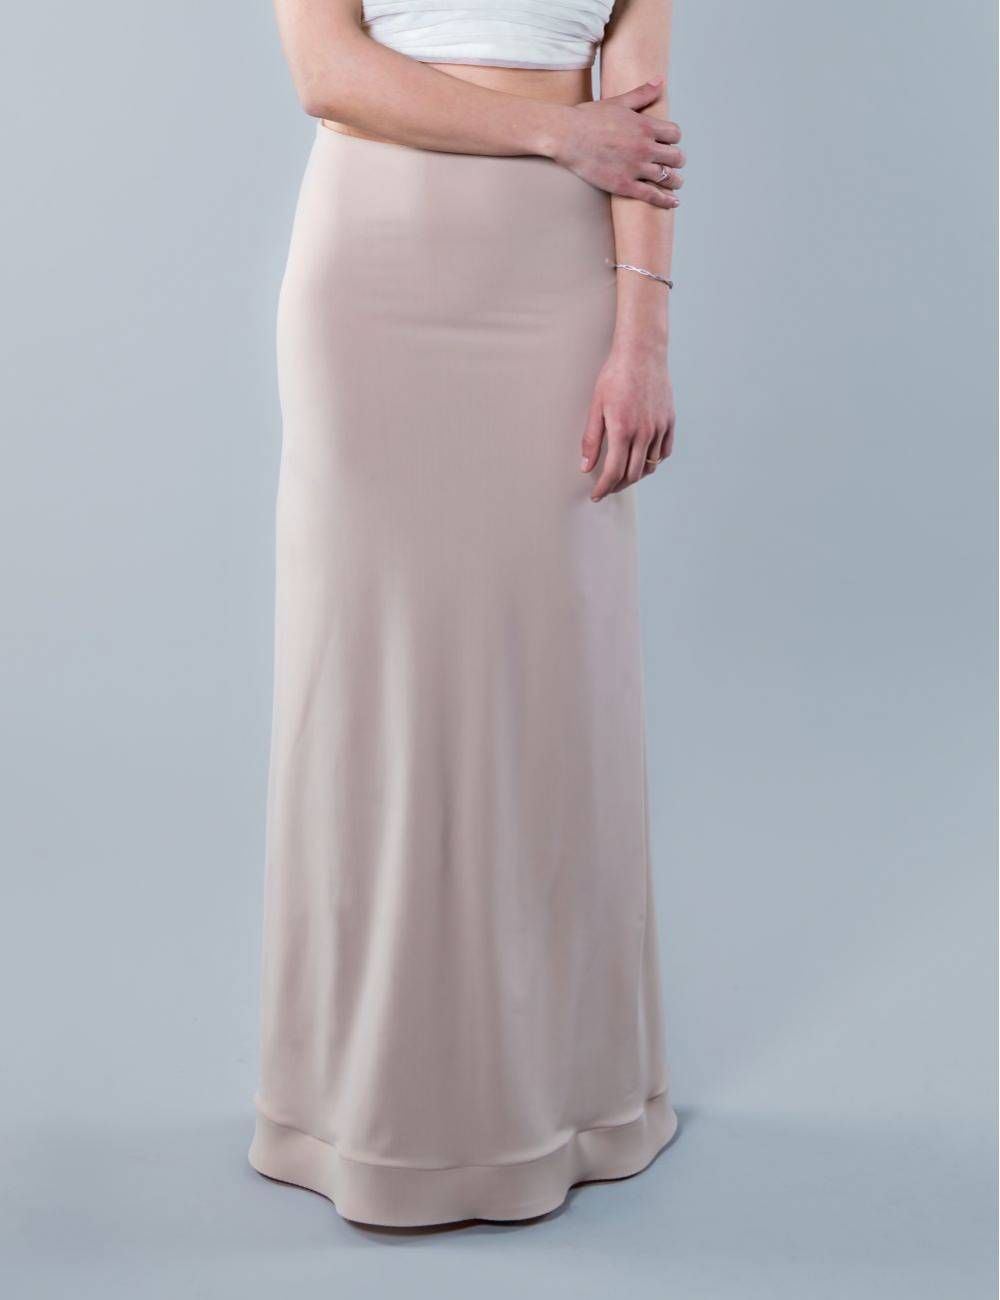 Enagua vestido de novia nude